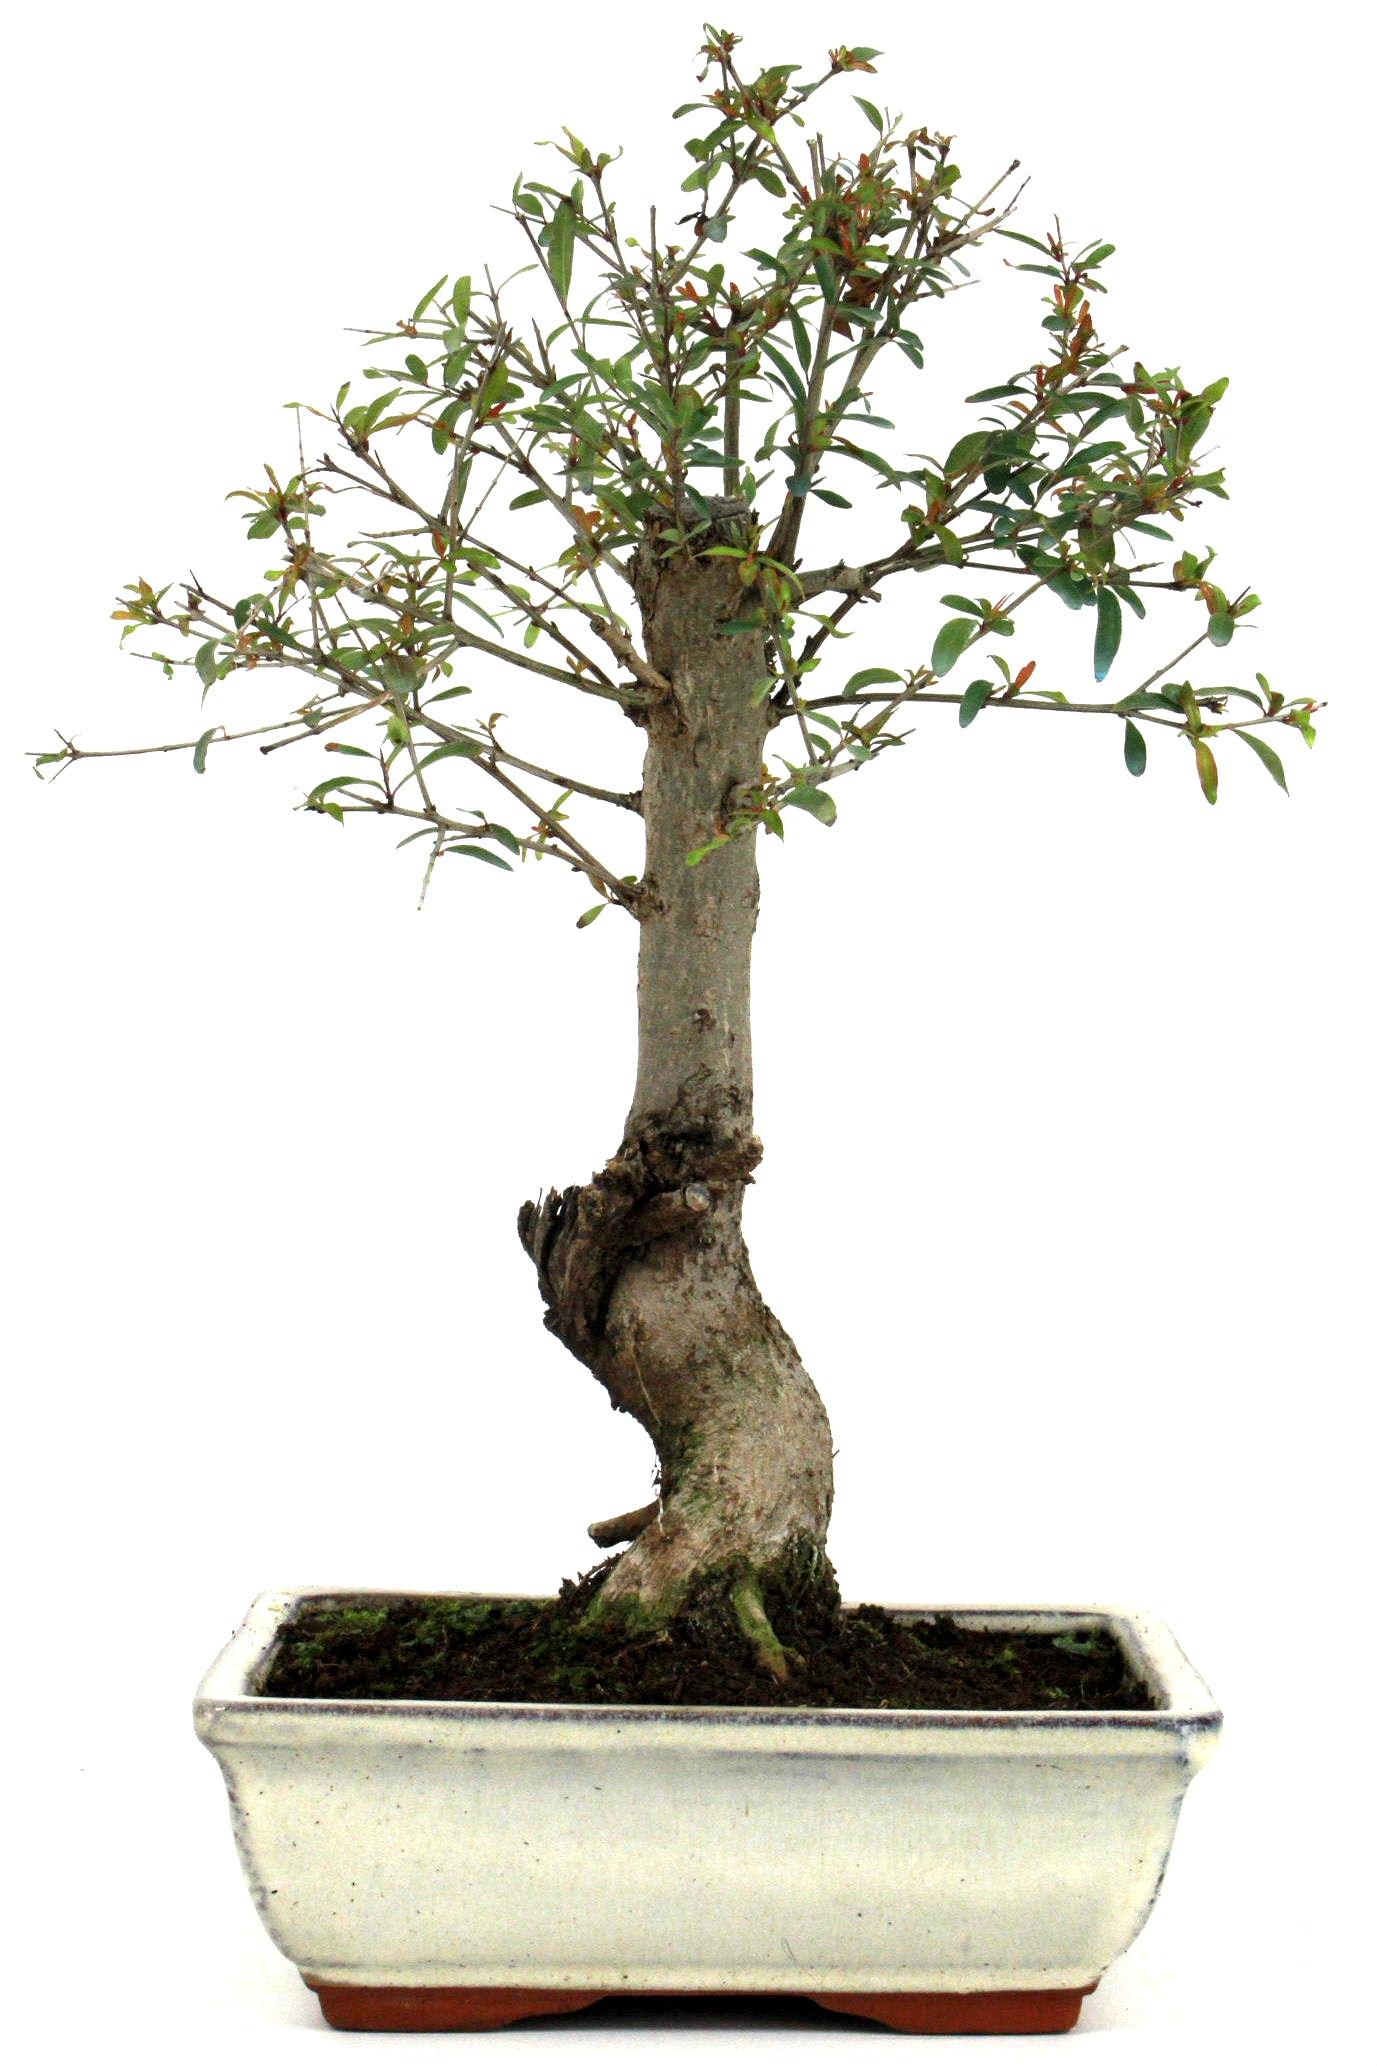 bonsai granatapfel 35 40 cm 191 bei oyaki bonsai kaufen. Black Bedroom Furniture Sets. Home Design Ideas